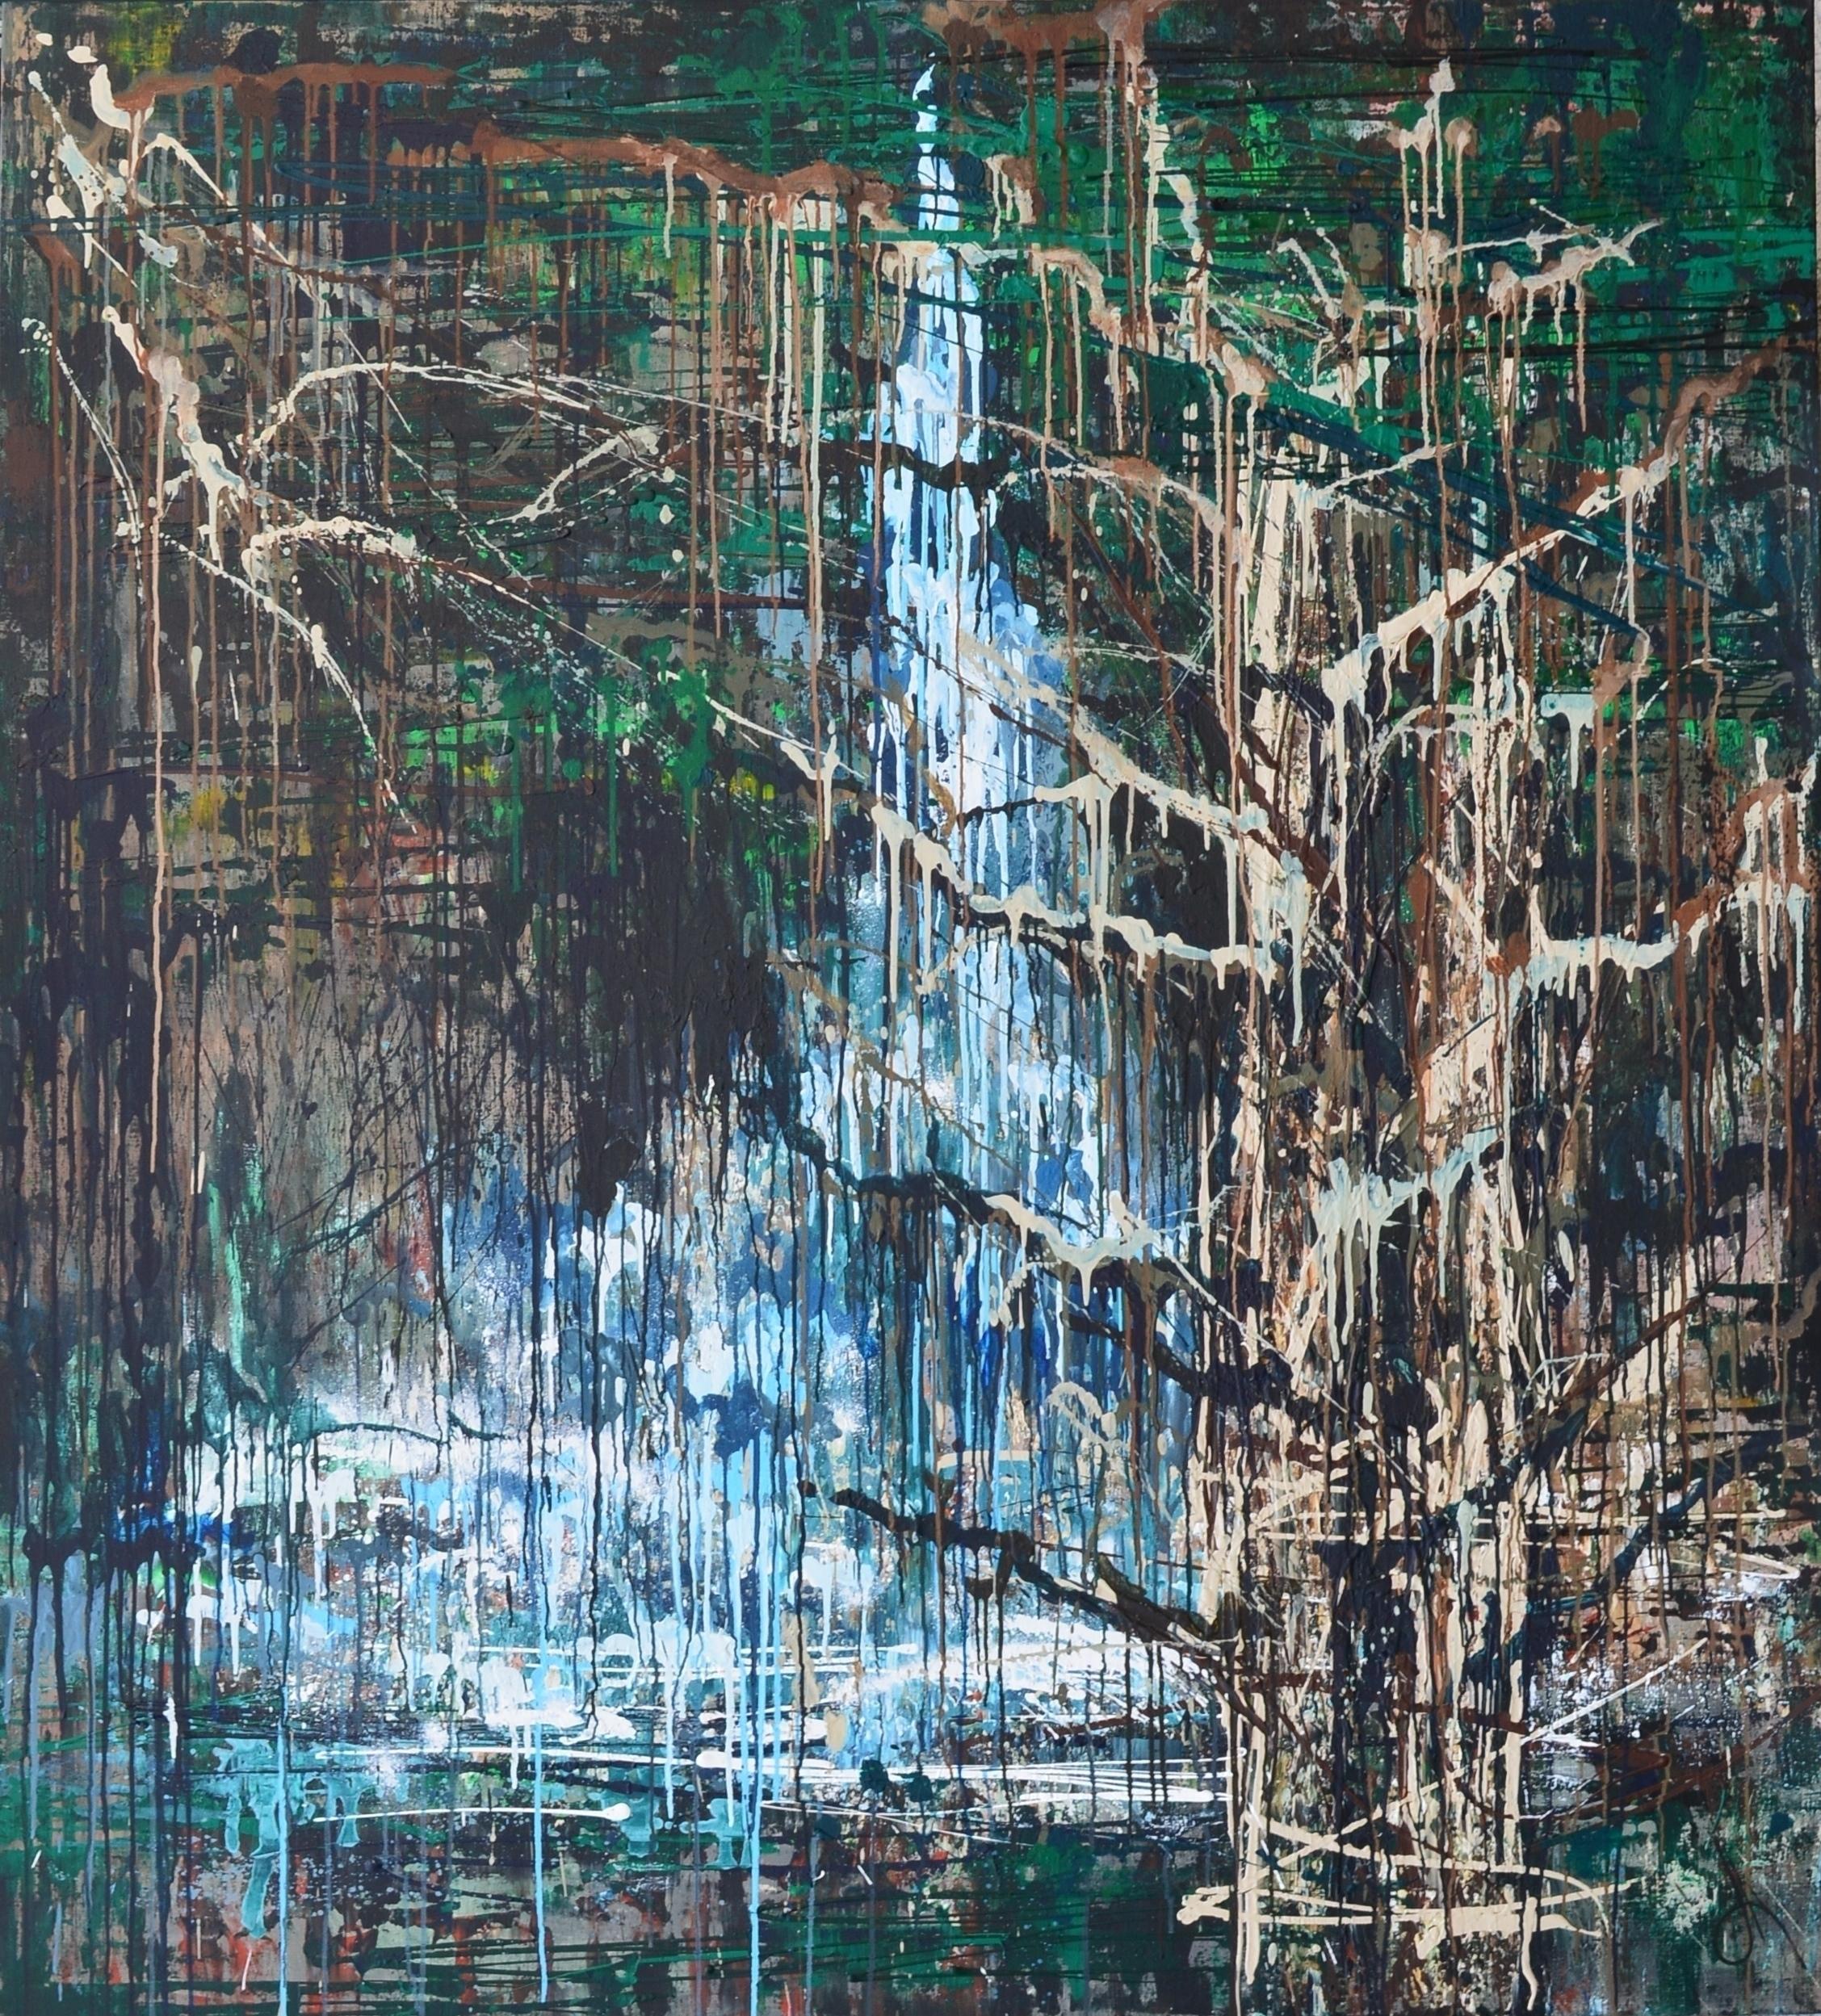 Rainy music forest 200x180 Acry - tanya_vasilenko | ello